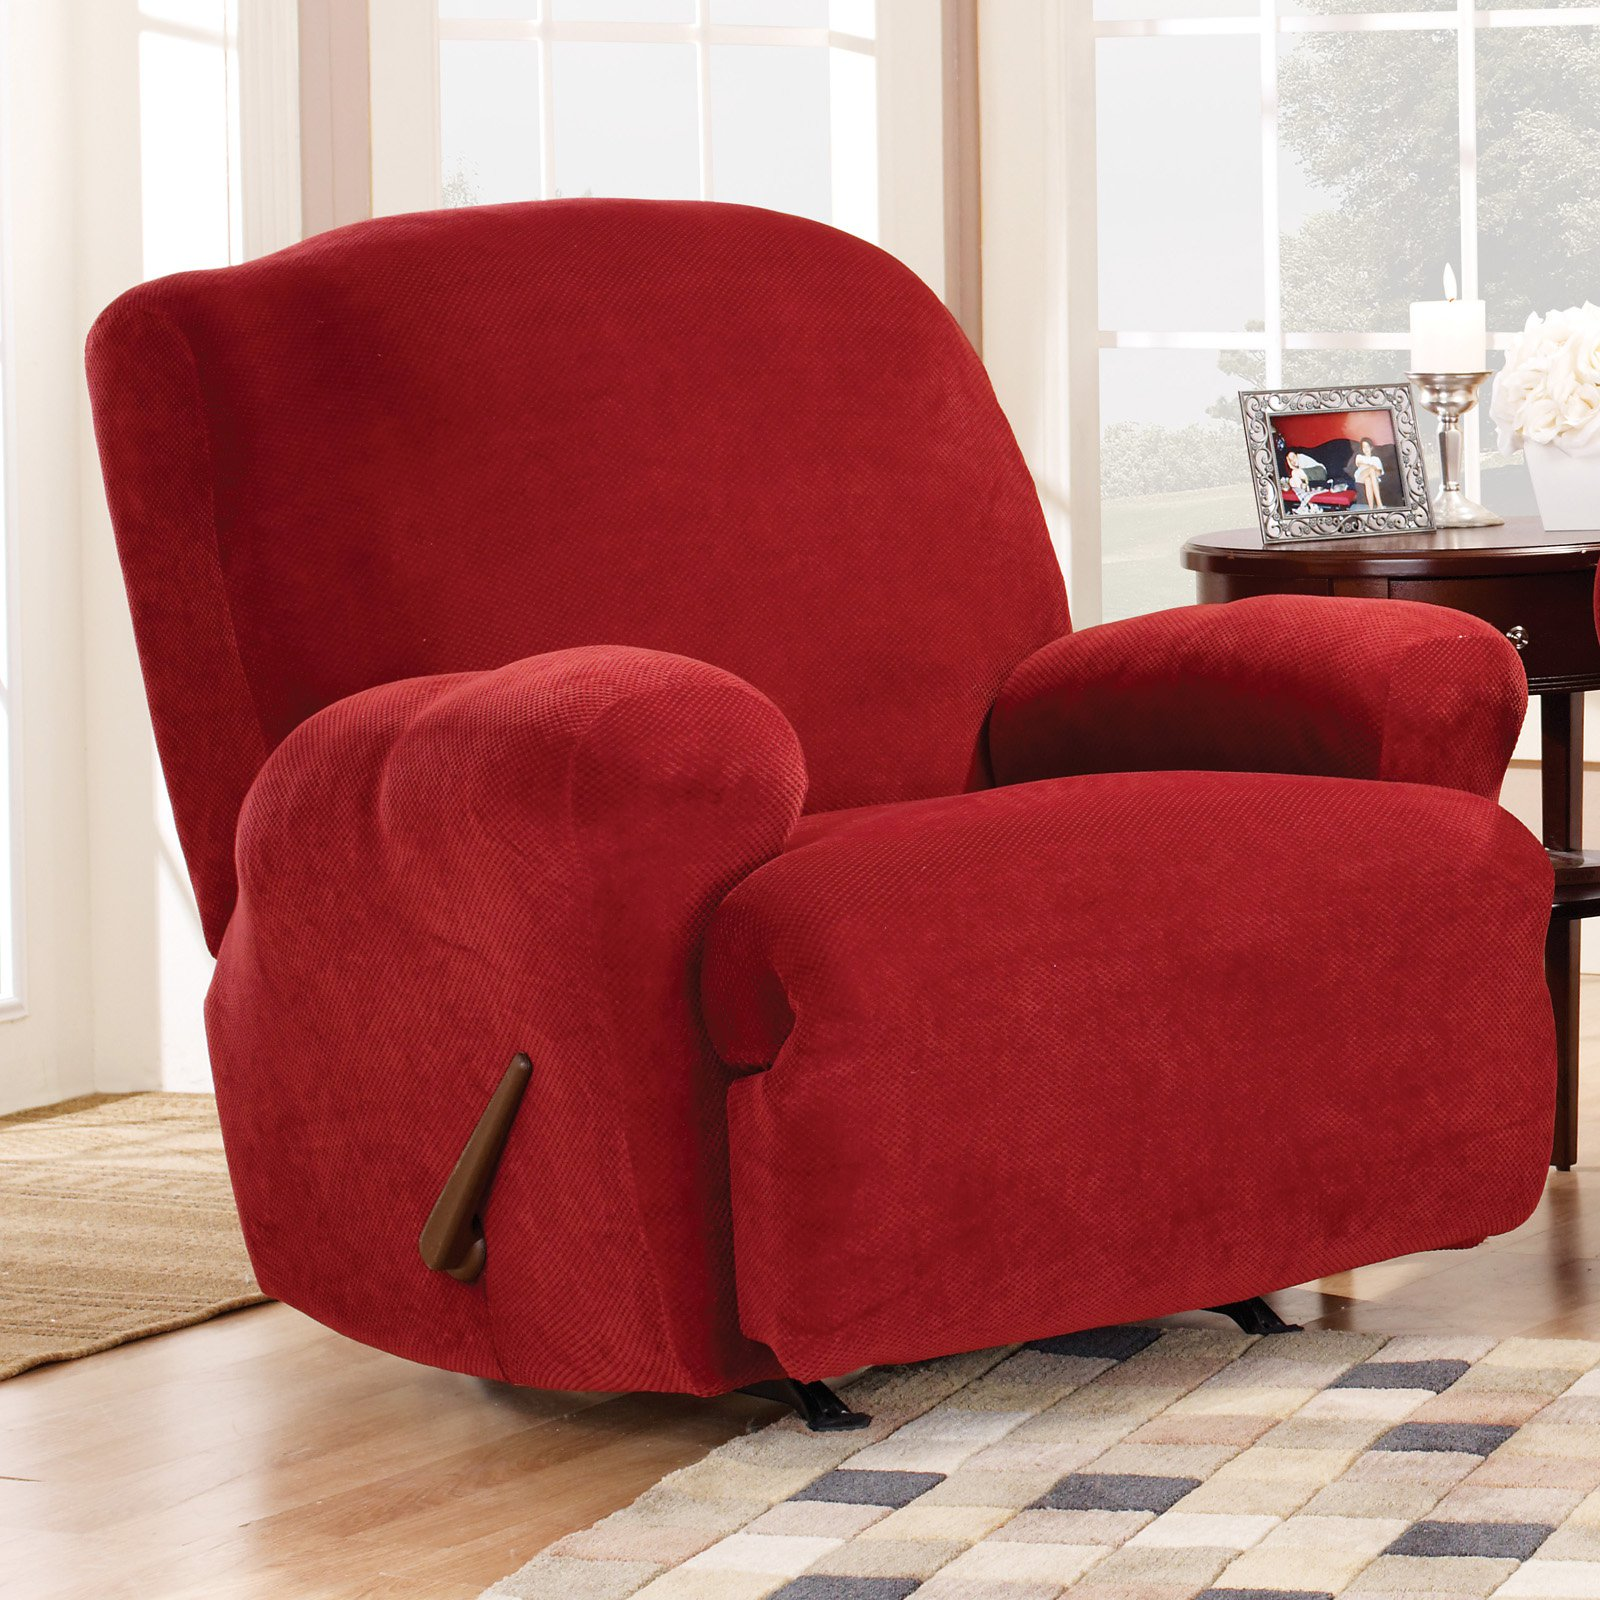 cotton recliner chair covers sand bag sure fit stretch pique lift slipcover medium walmart com